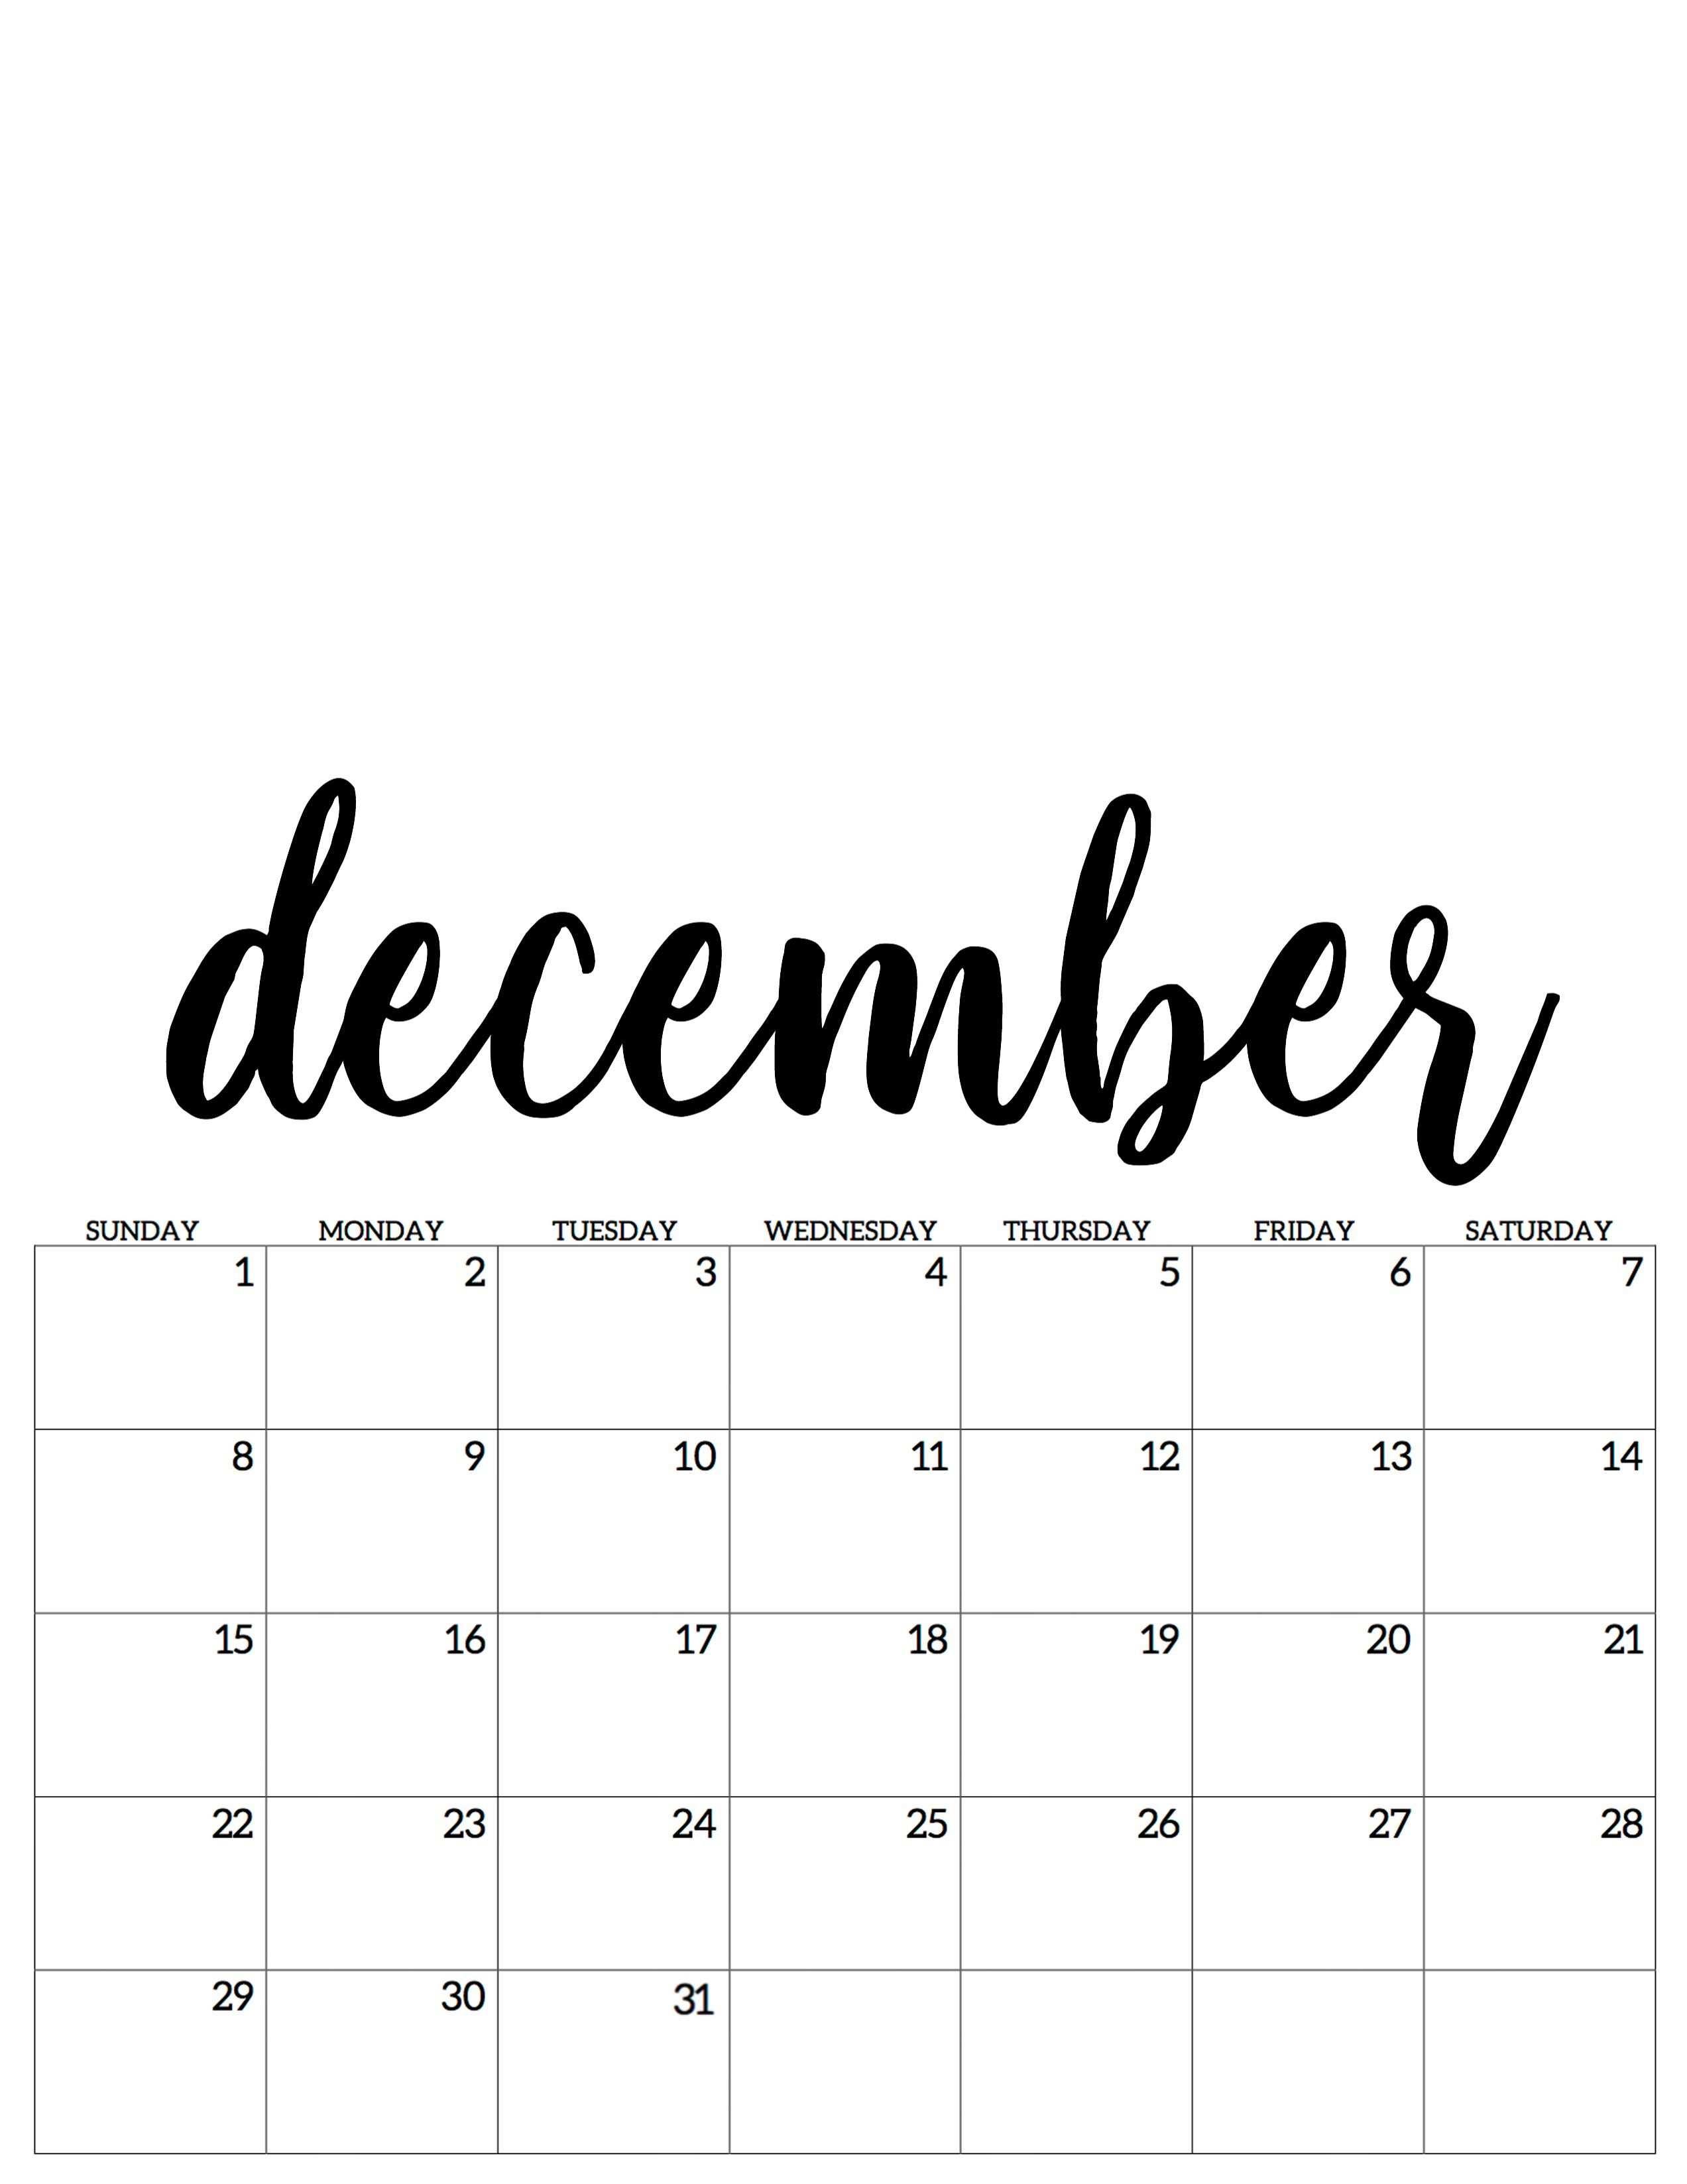 December Dezember Kalender Calendar 2019 Dezember Kalender